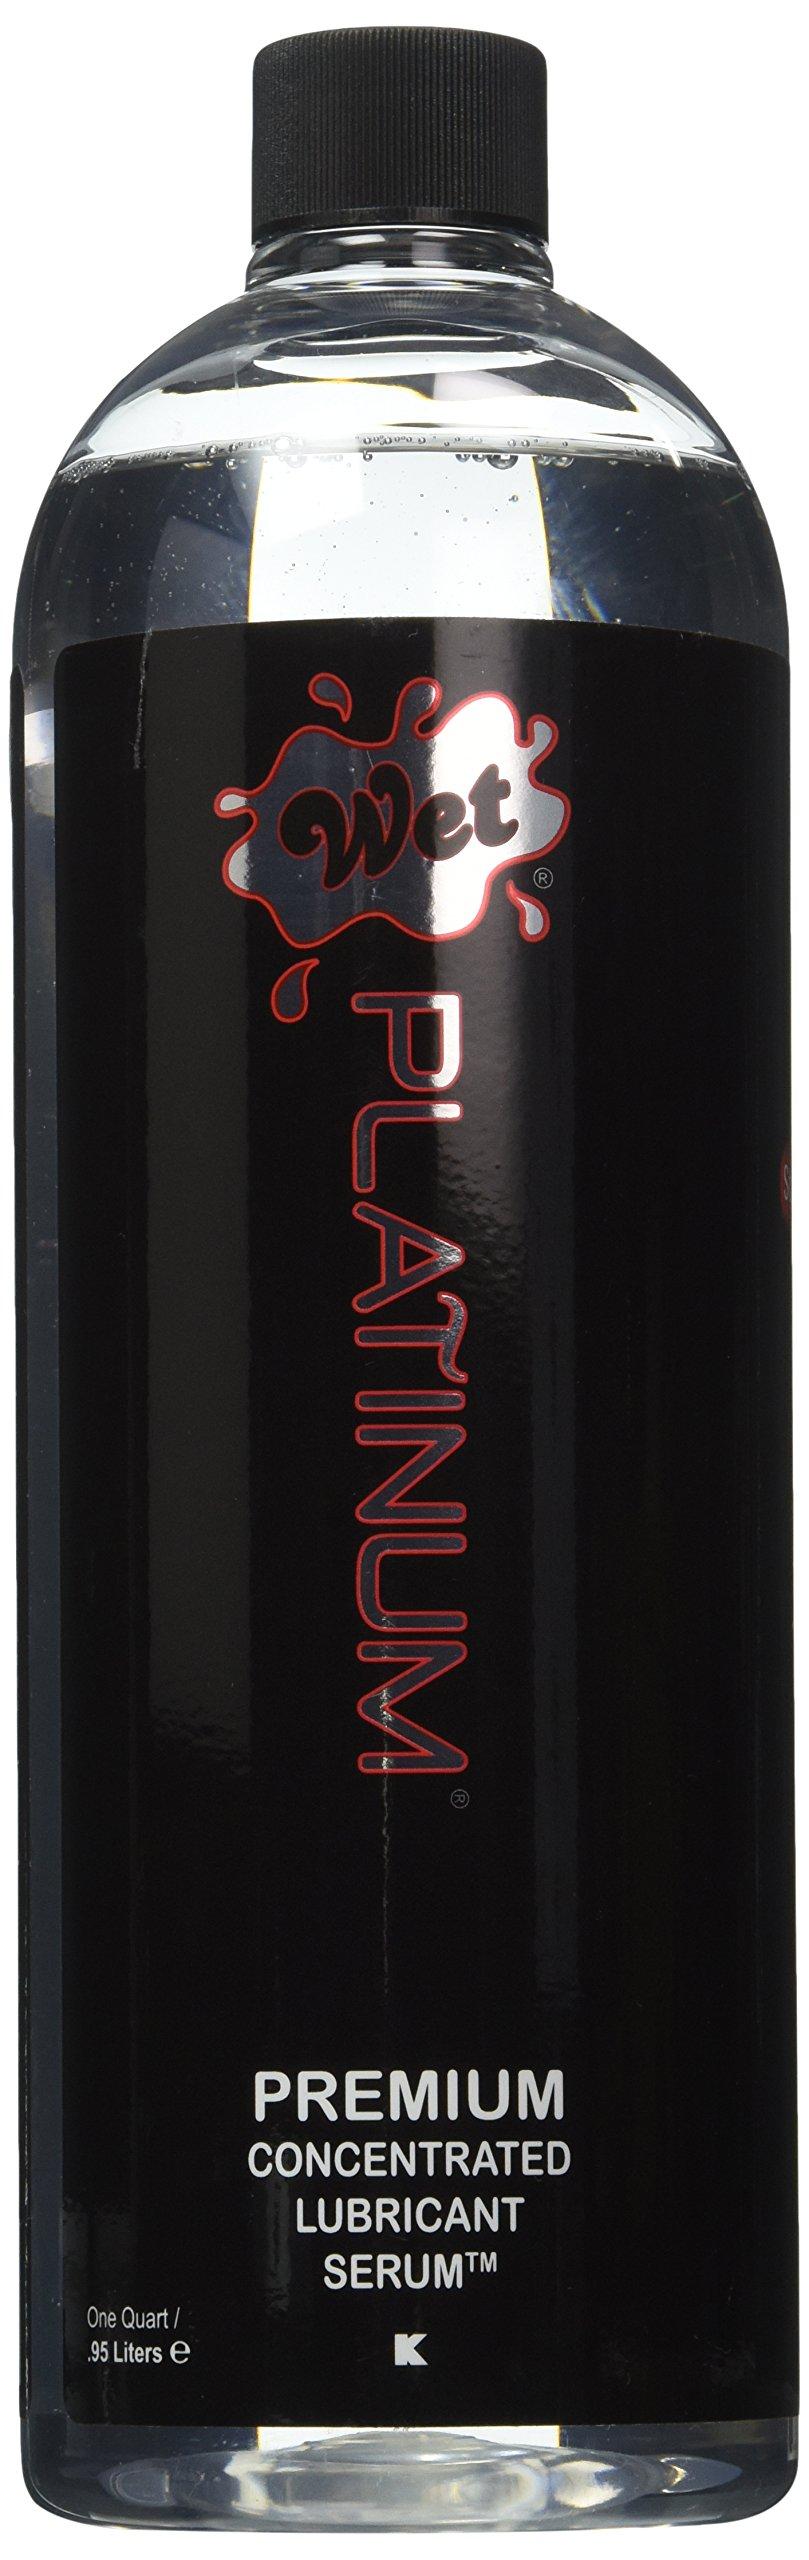 Wet Lubes Platinum Quart Lubricant, 1 Quart Bottle by Wet Lubes (Image #1)